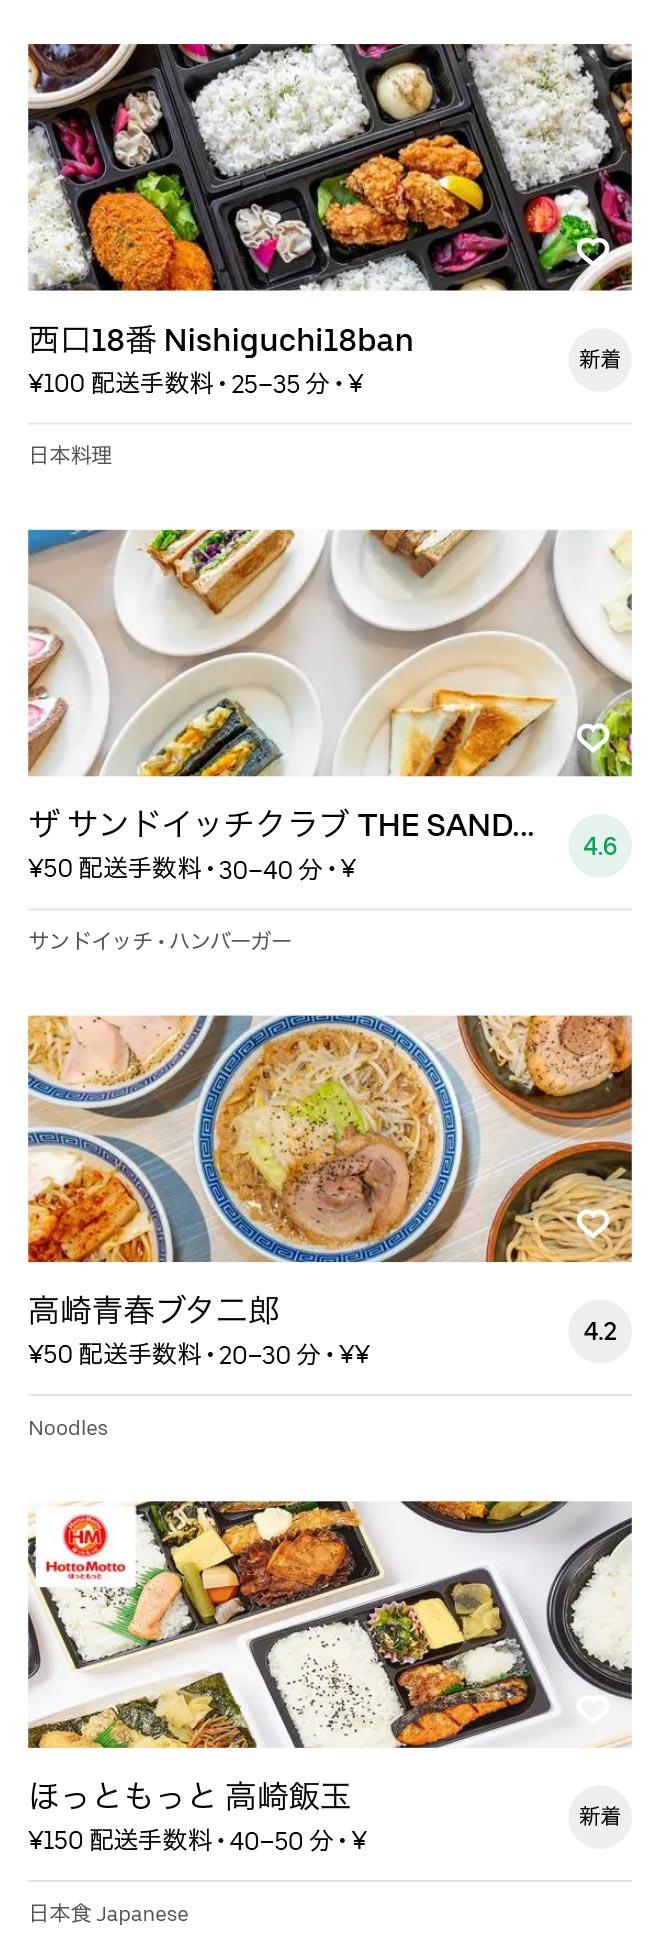 Takasaki menu 2010 04